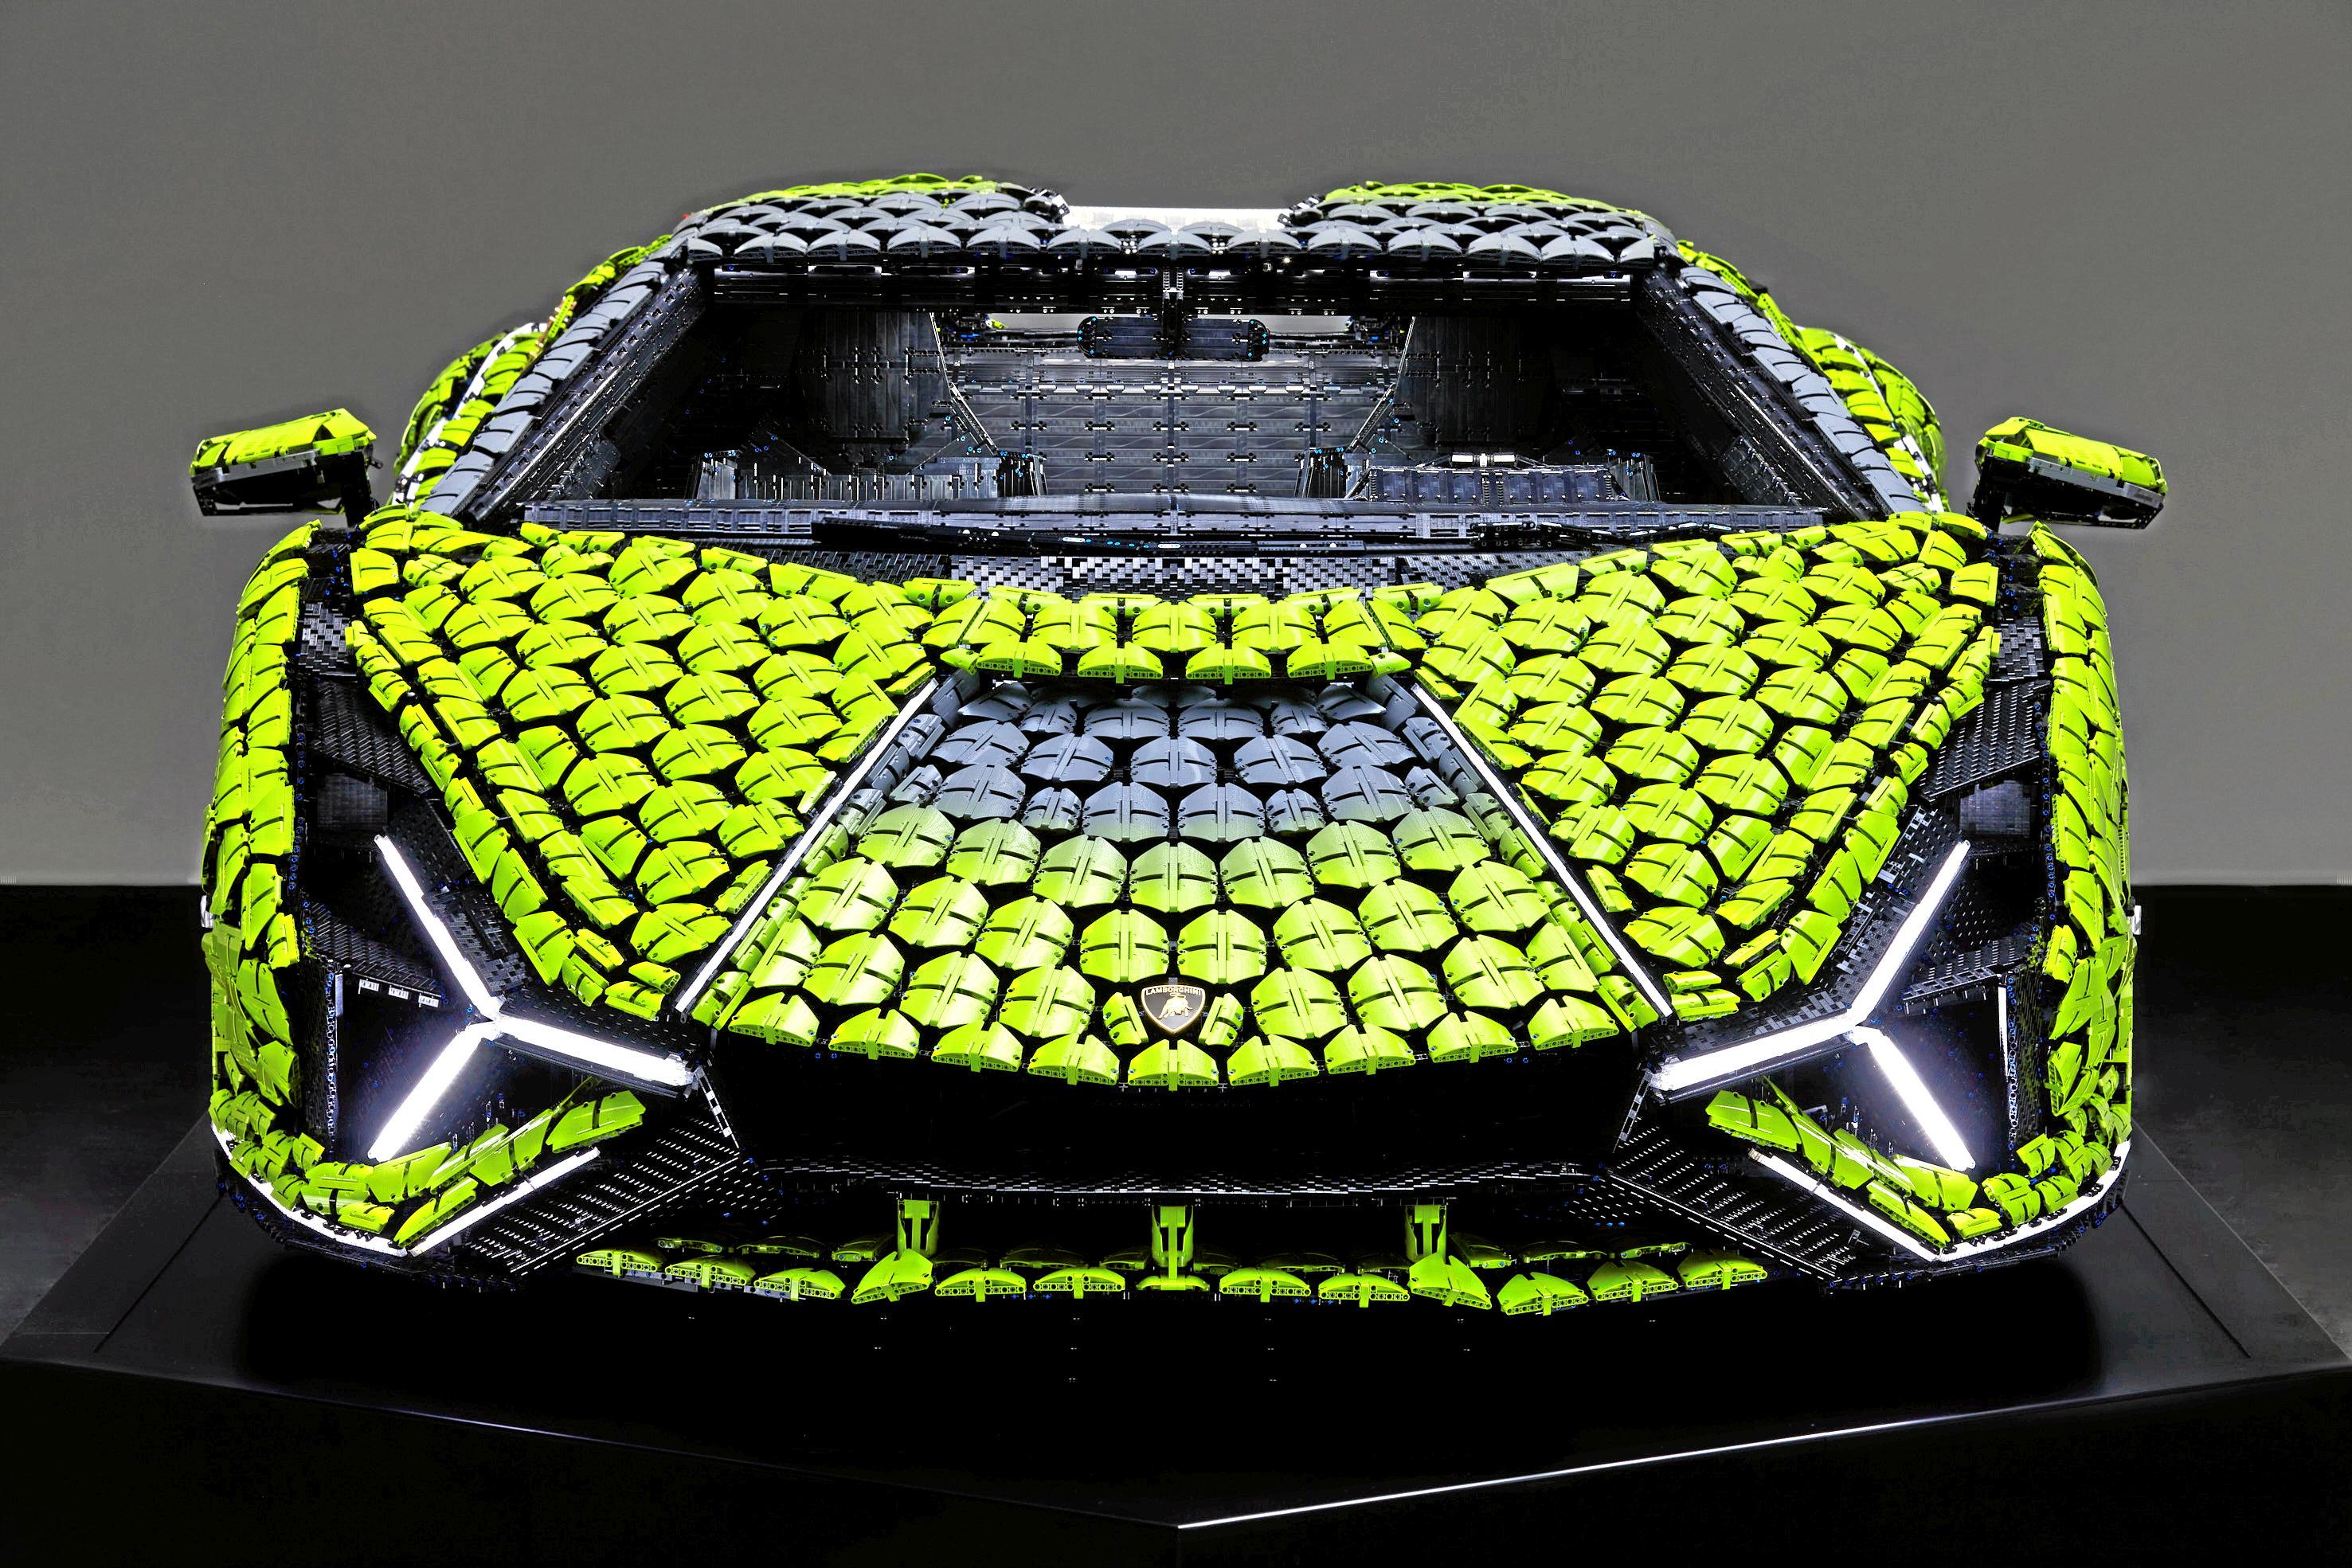 Lego-bil front